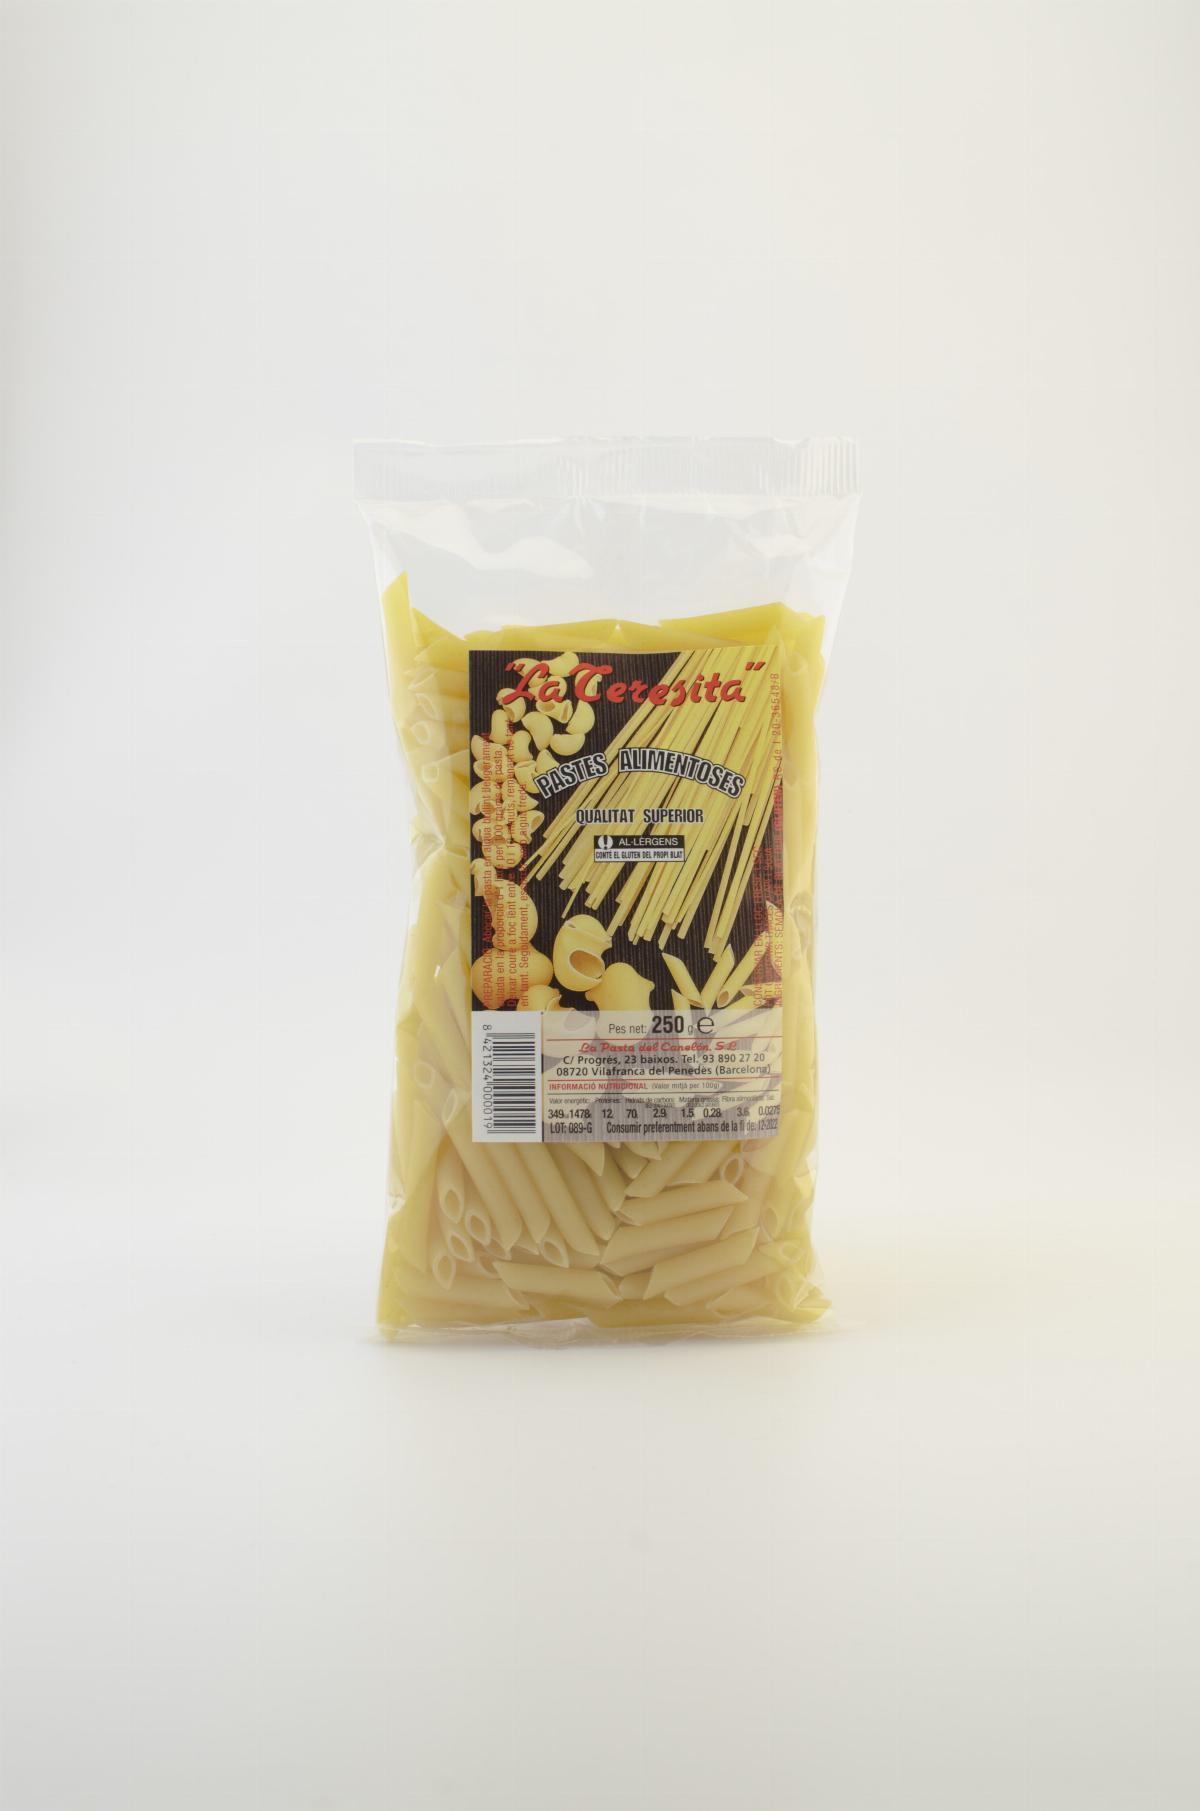 Pasta Tradicional macarró La Teresita 250g